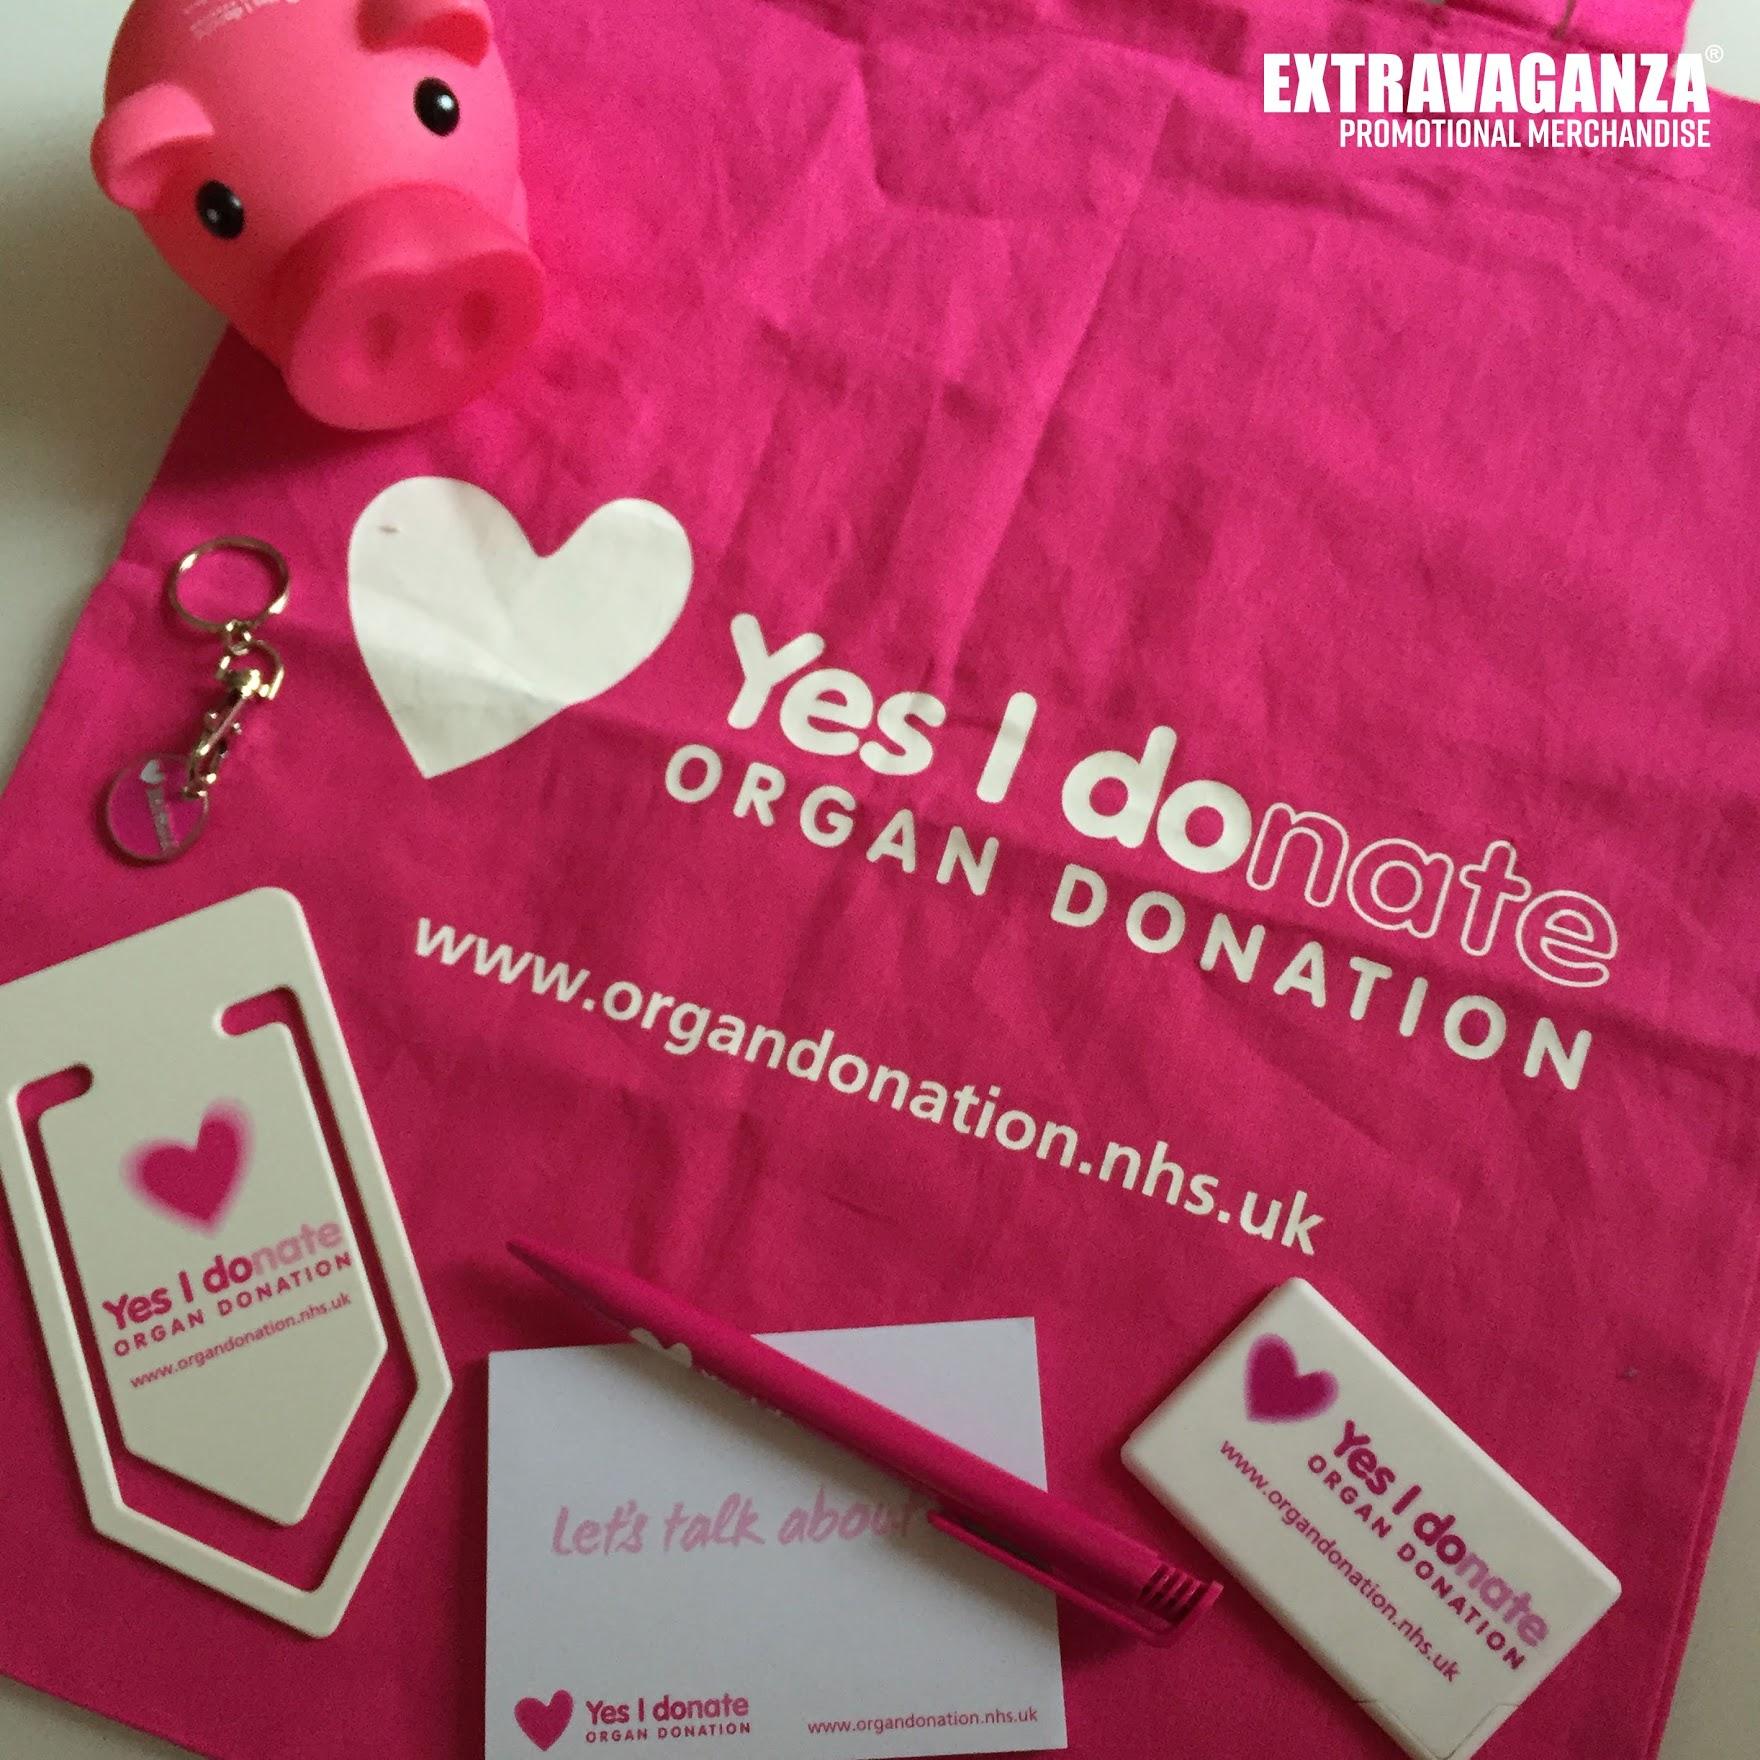 organ donation merchandise